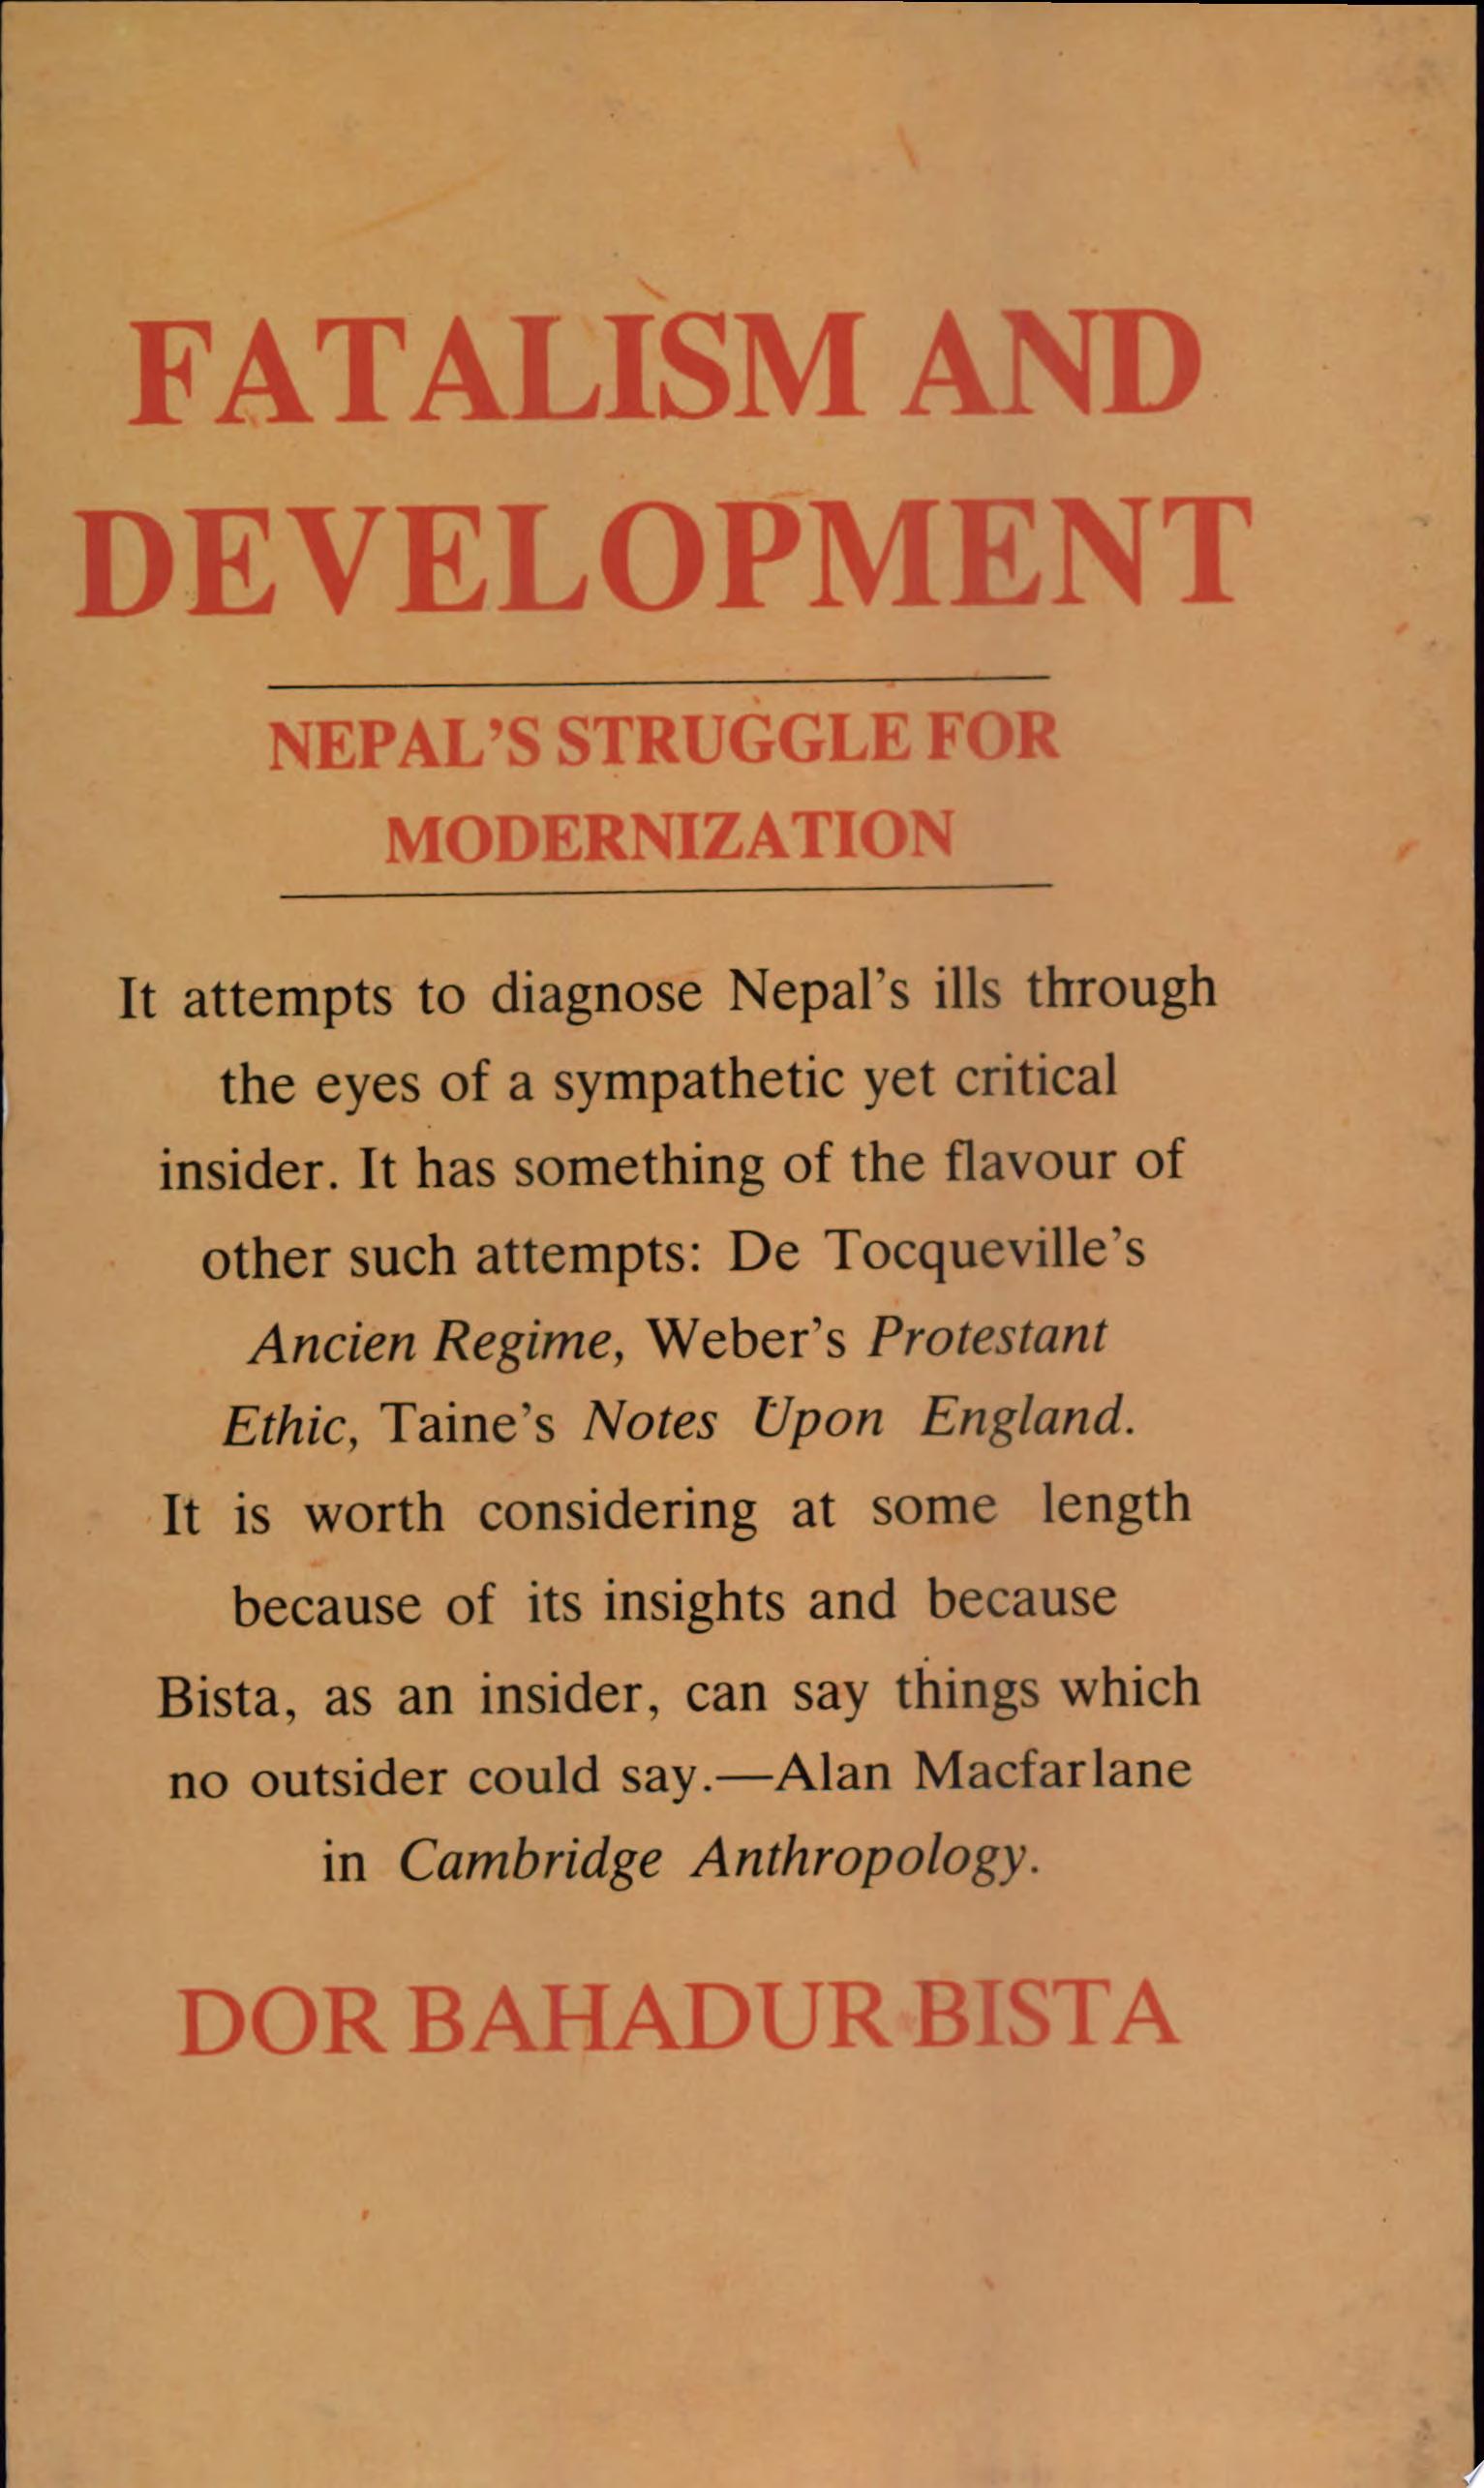 Fatalism and Development